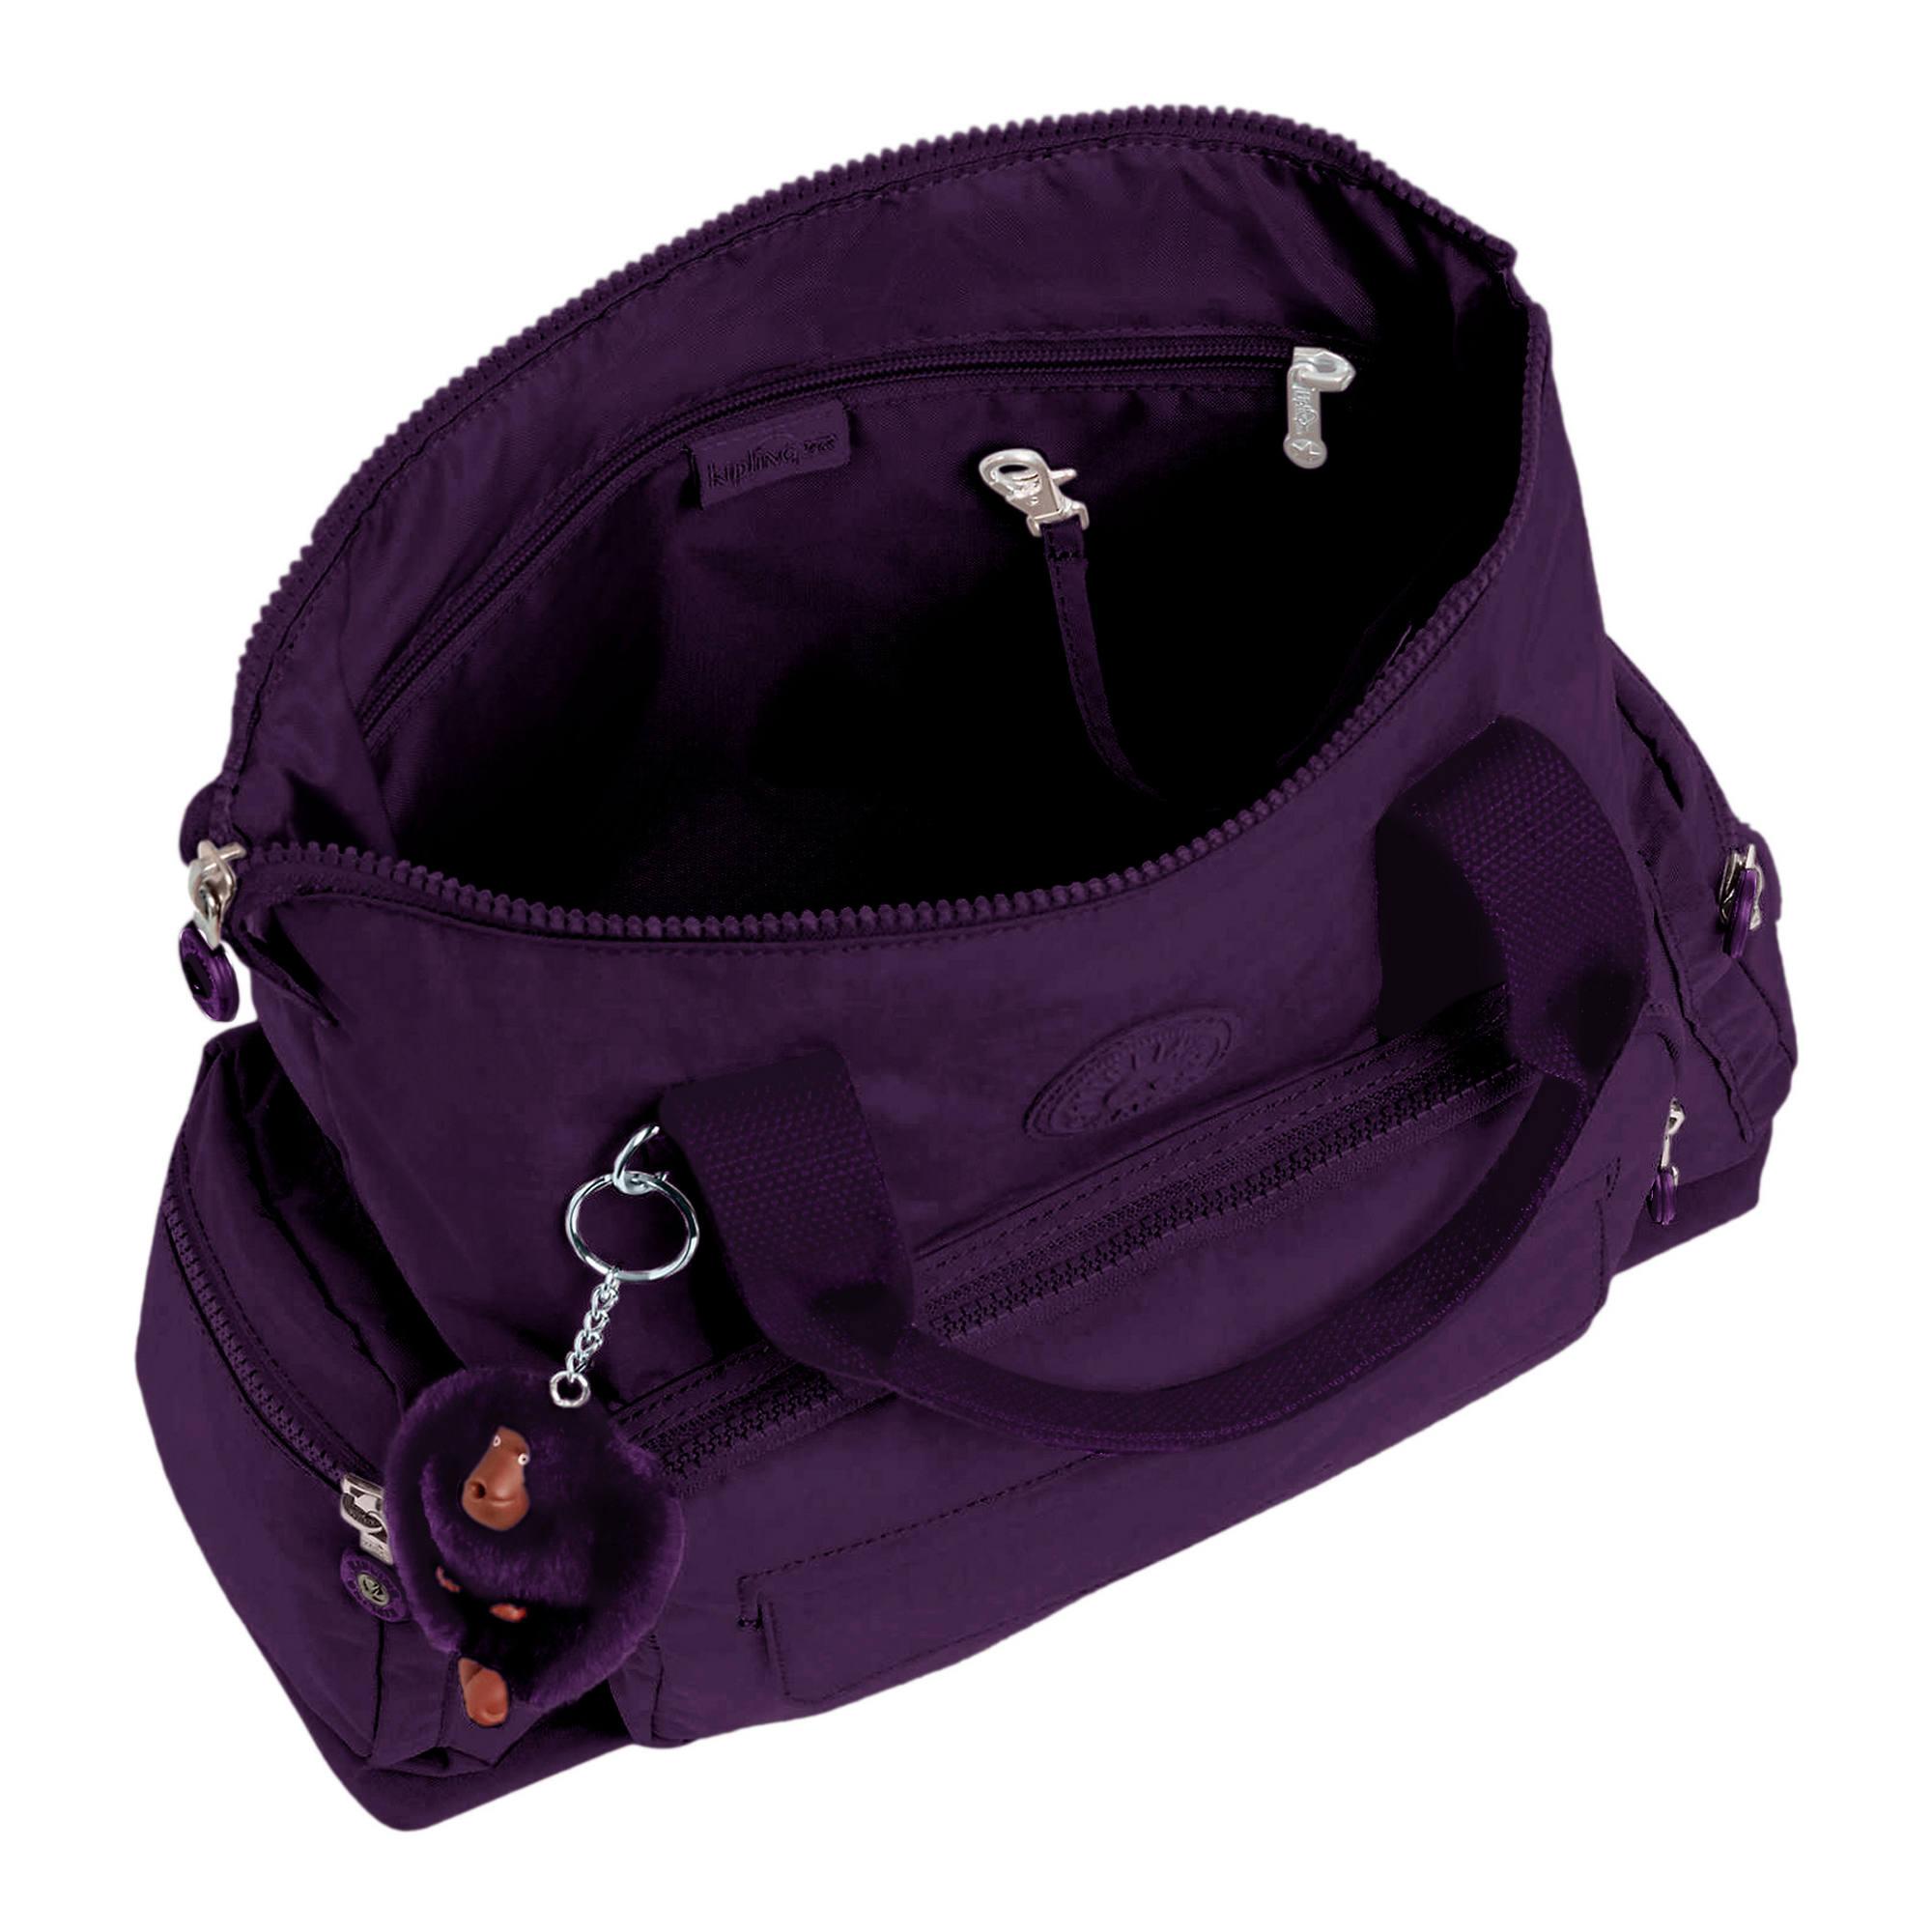 Kipling-Alvy-2-In-1-Convertible-Tote-Bag-Backpack miniatura 18